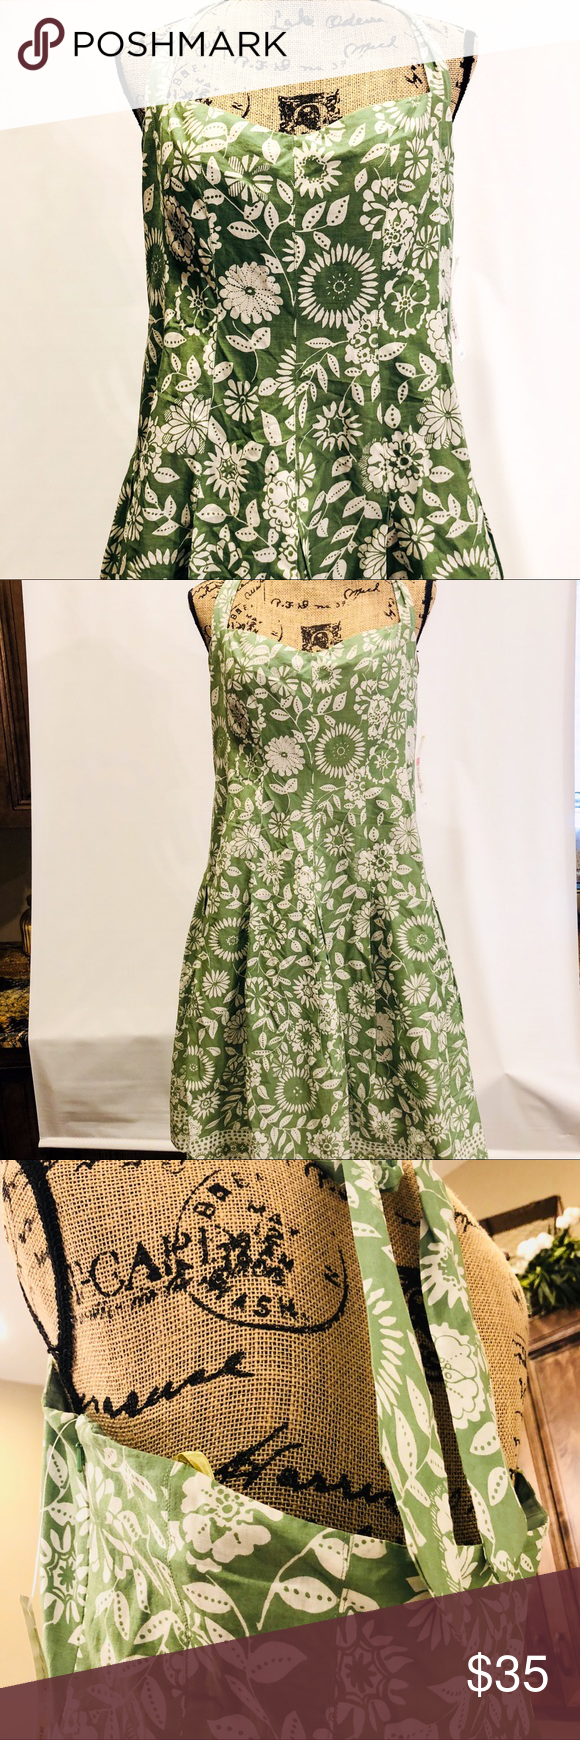 Sage Evan Picone Floral Summer Dress Size 14 Summer Dresses Size 14 Dresses Floral Dress Summer [ 1740 x 580 Pixel ]